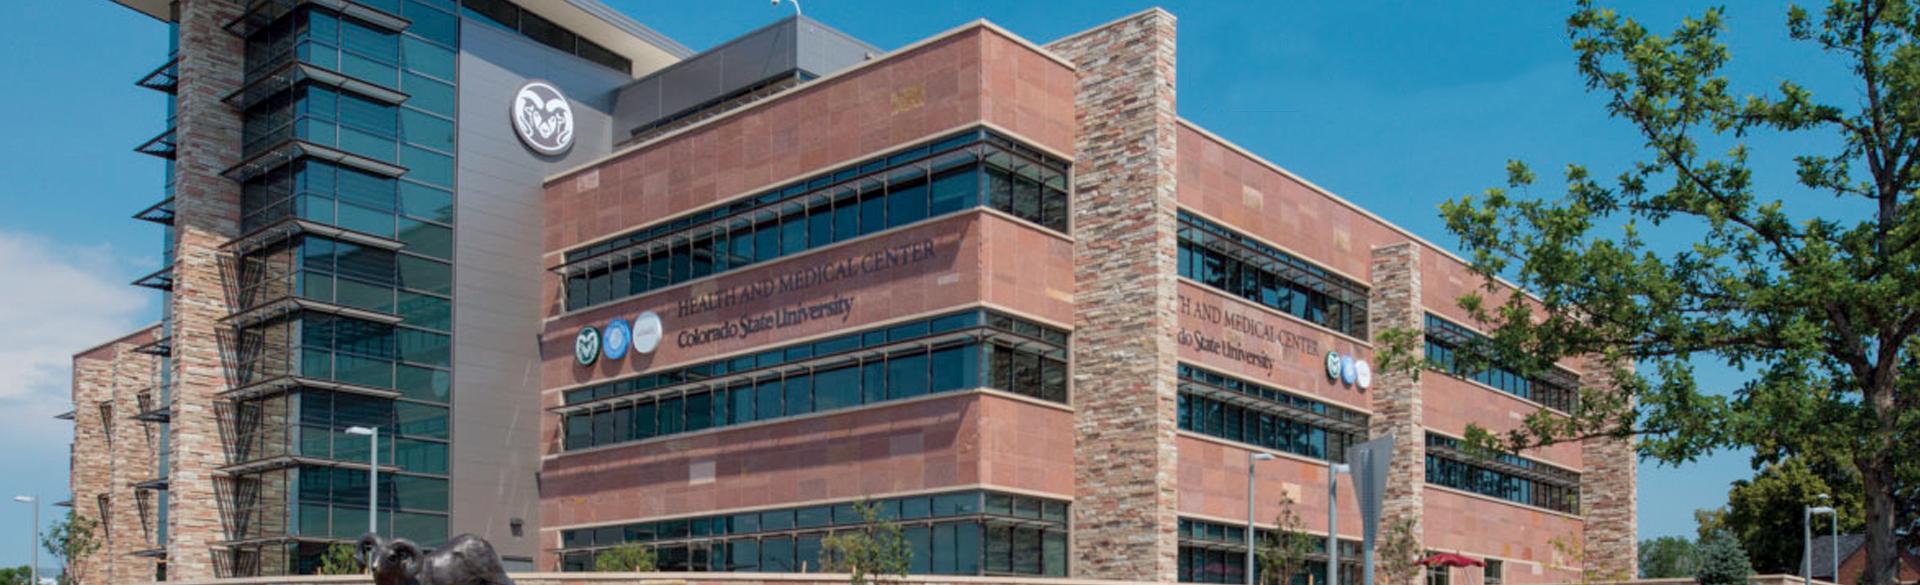 CU-CSU Partner to Open Medical School Branch